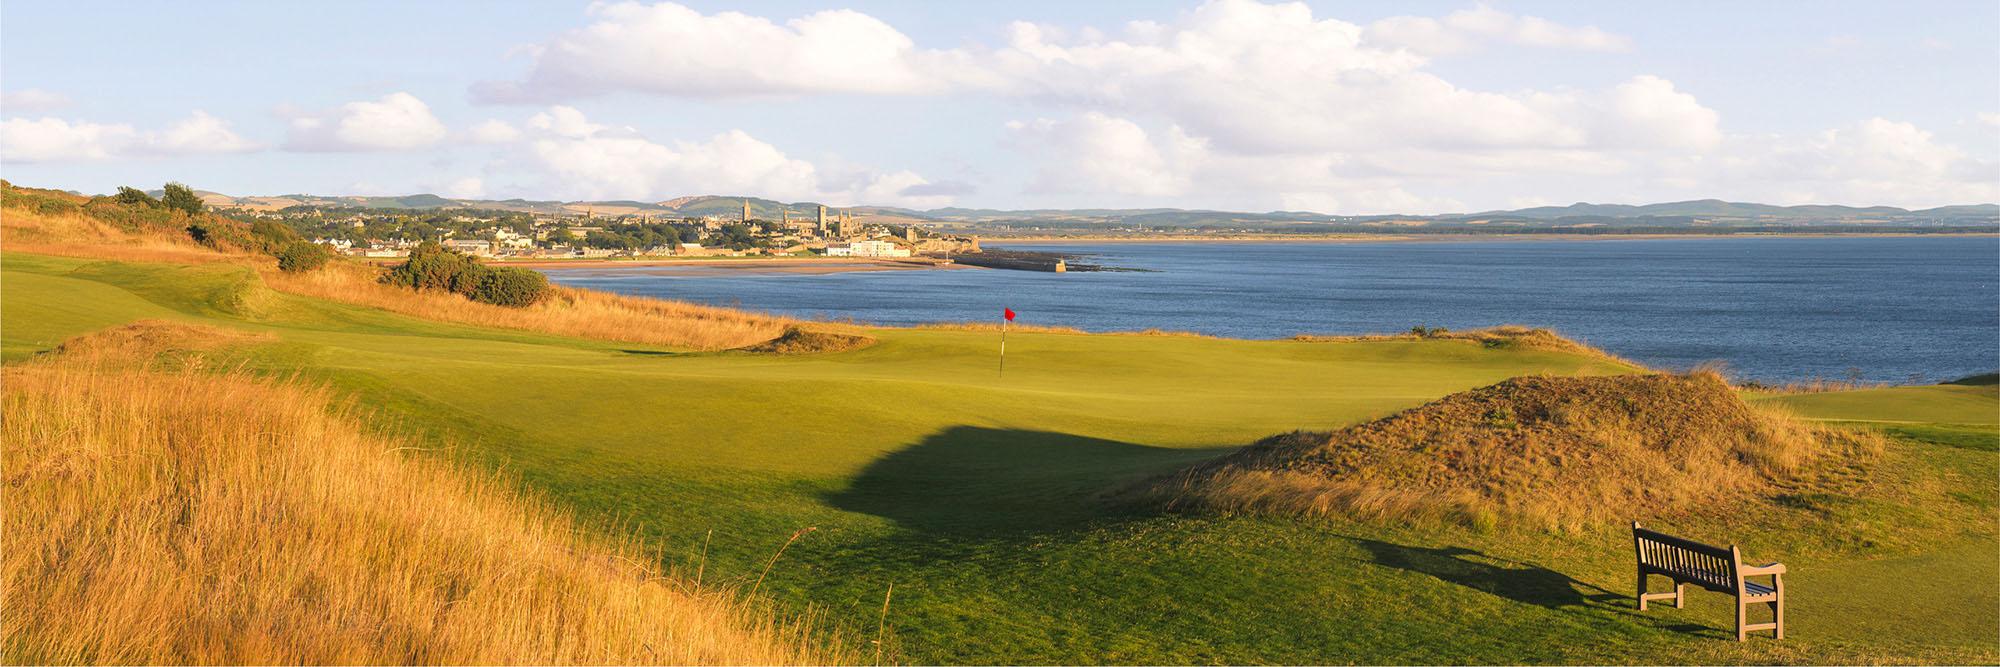 Golf Course Image - St Andrews Castle No. 7